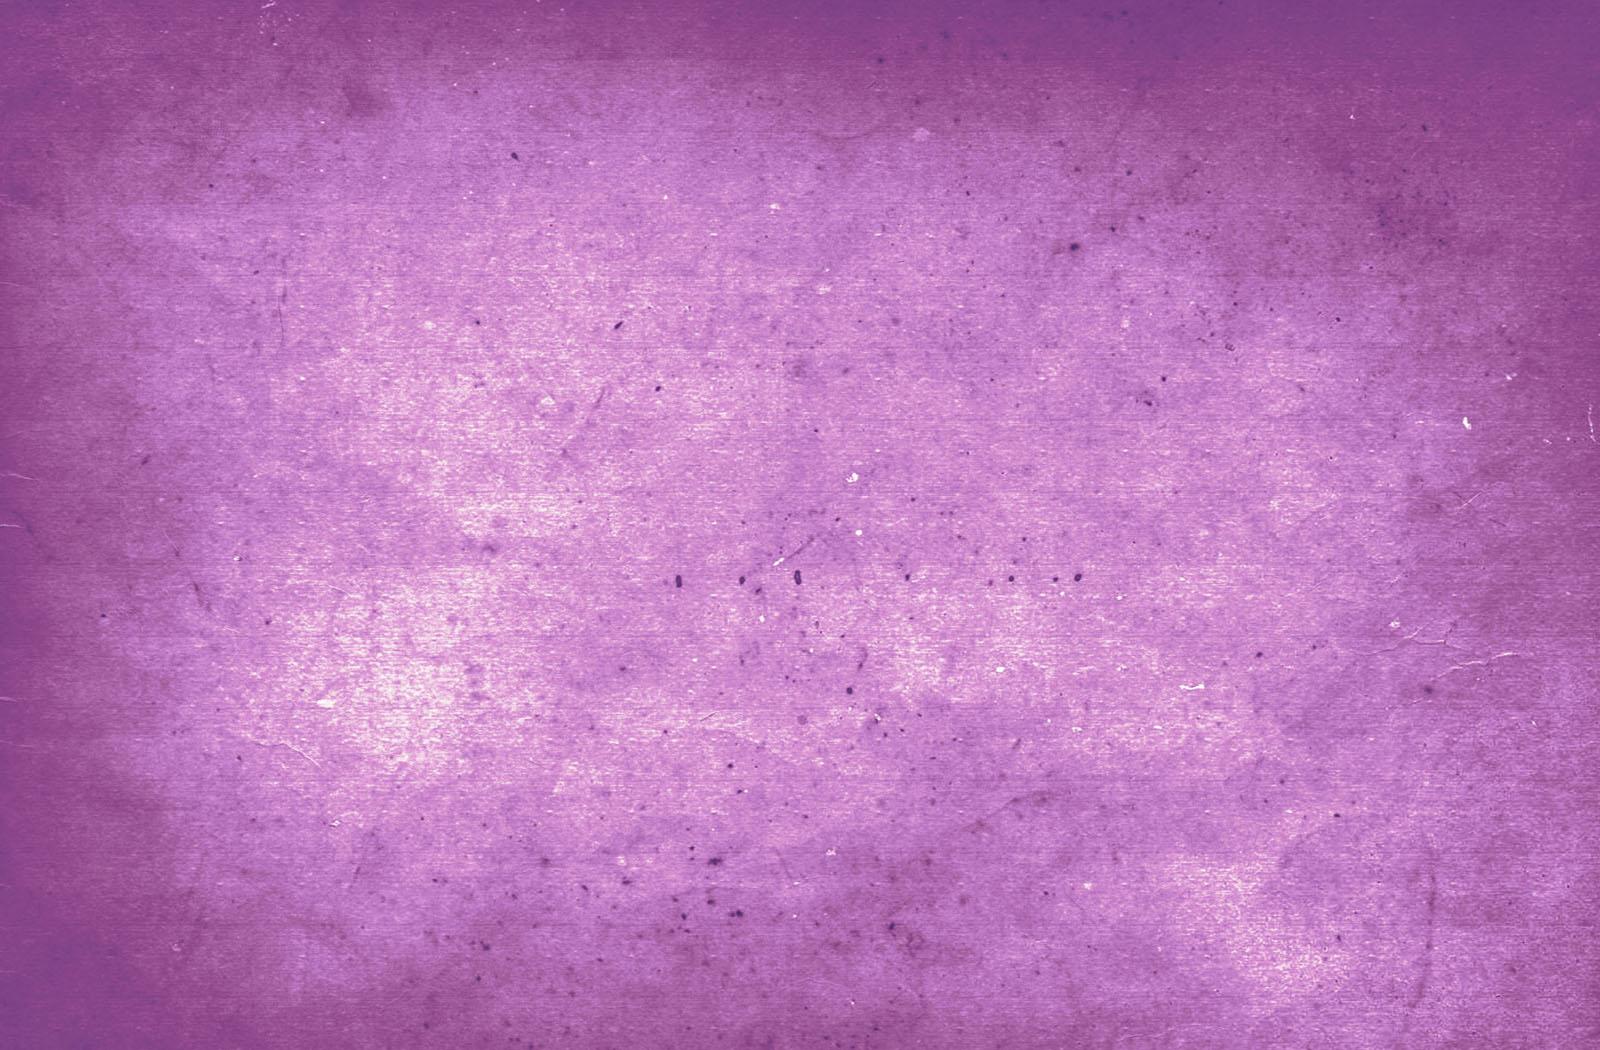 Gif Wallpaper Tumblr Jessica Alba Hd Iphone Wallpaper 1600x1050